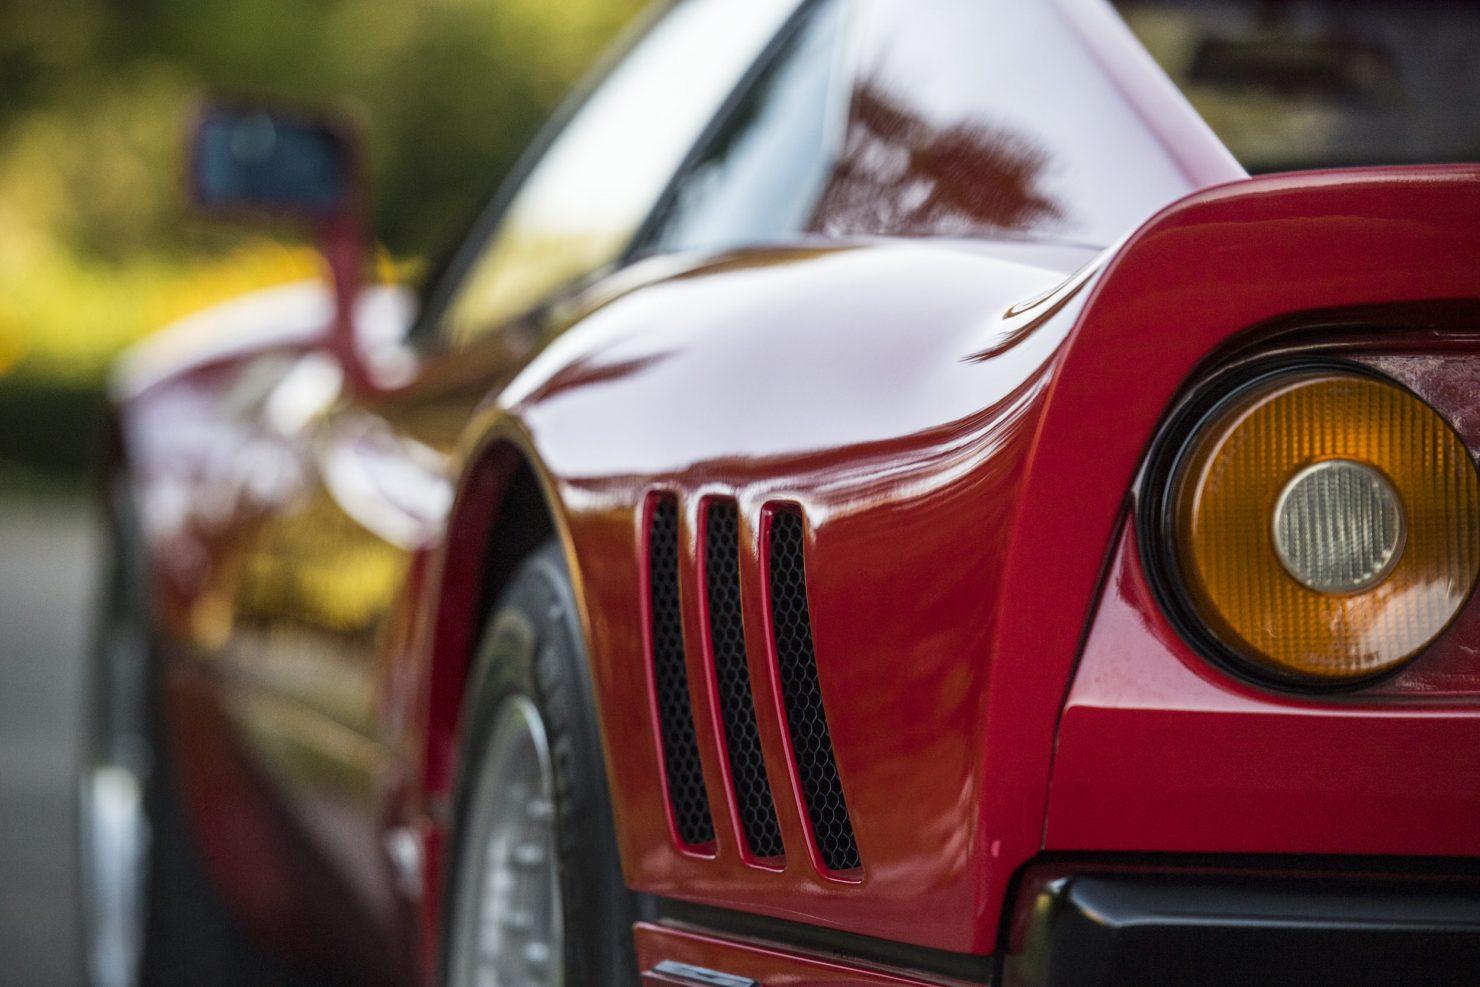 Ferrari 288 GTO 6 1480x987 - 1985 Ferrari 288 GTO